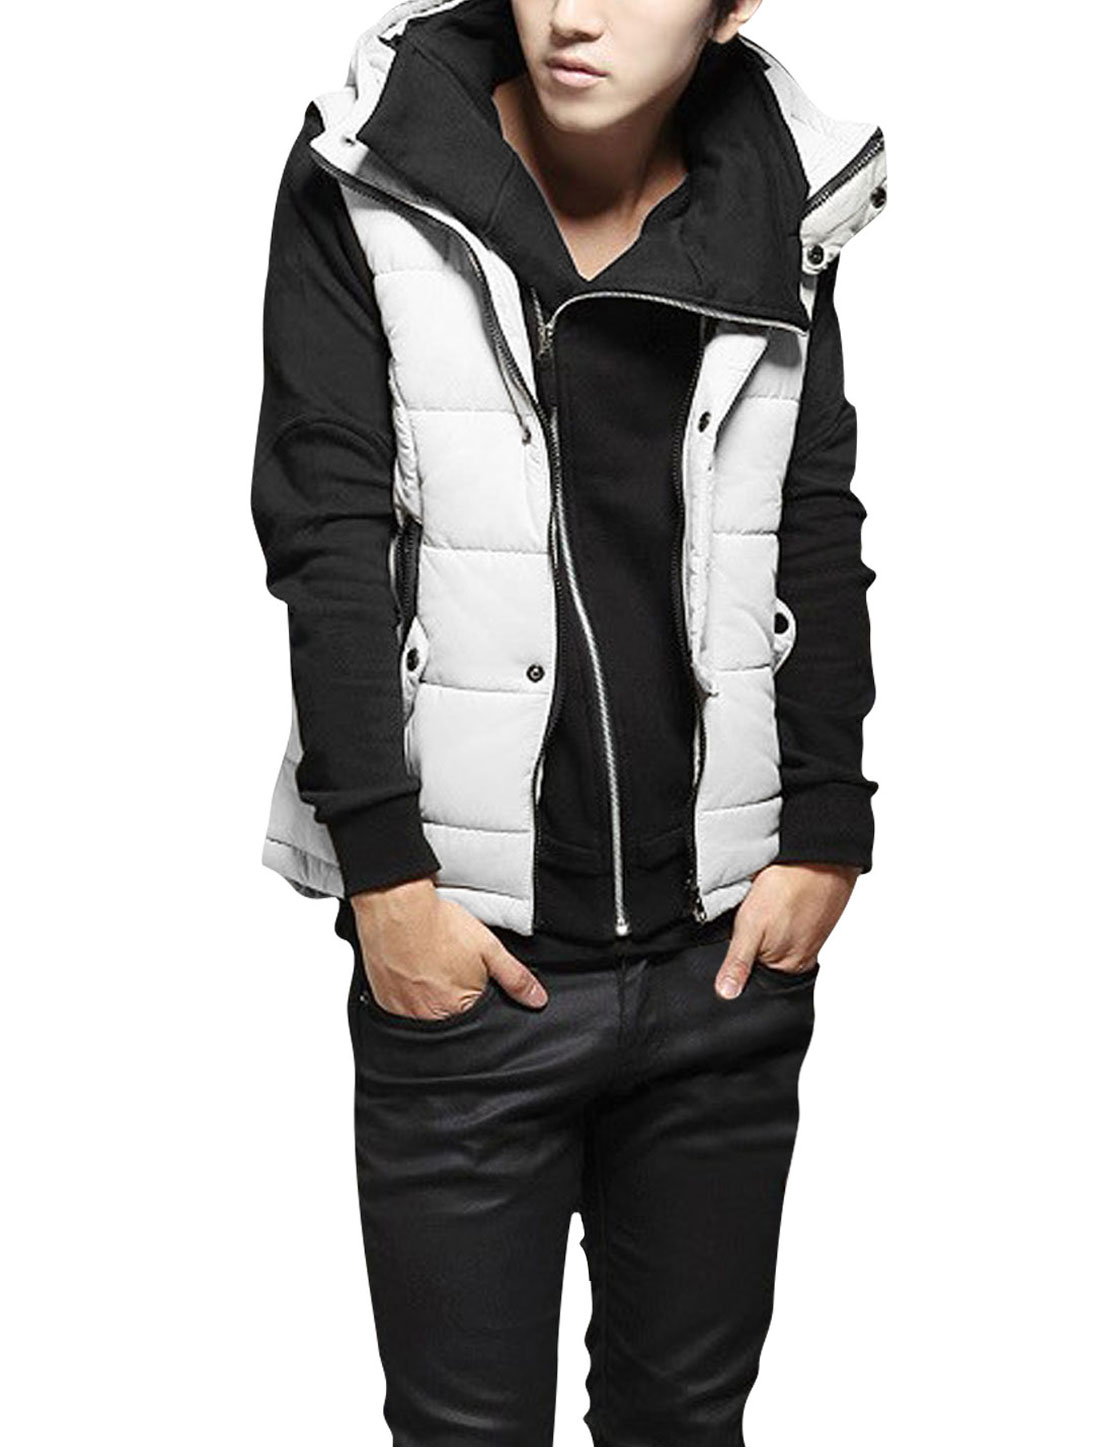 Mens Sleeveless Snap Fastener Korea Stylish White Padded Vest M